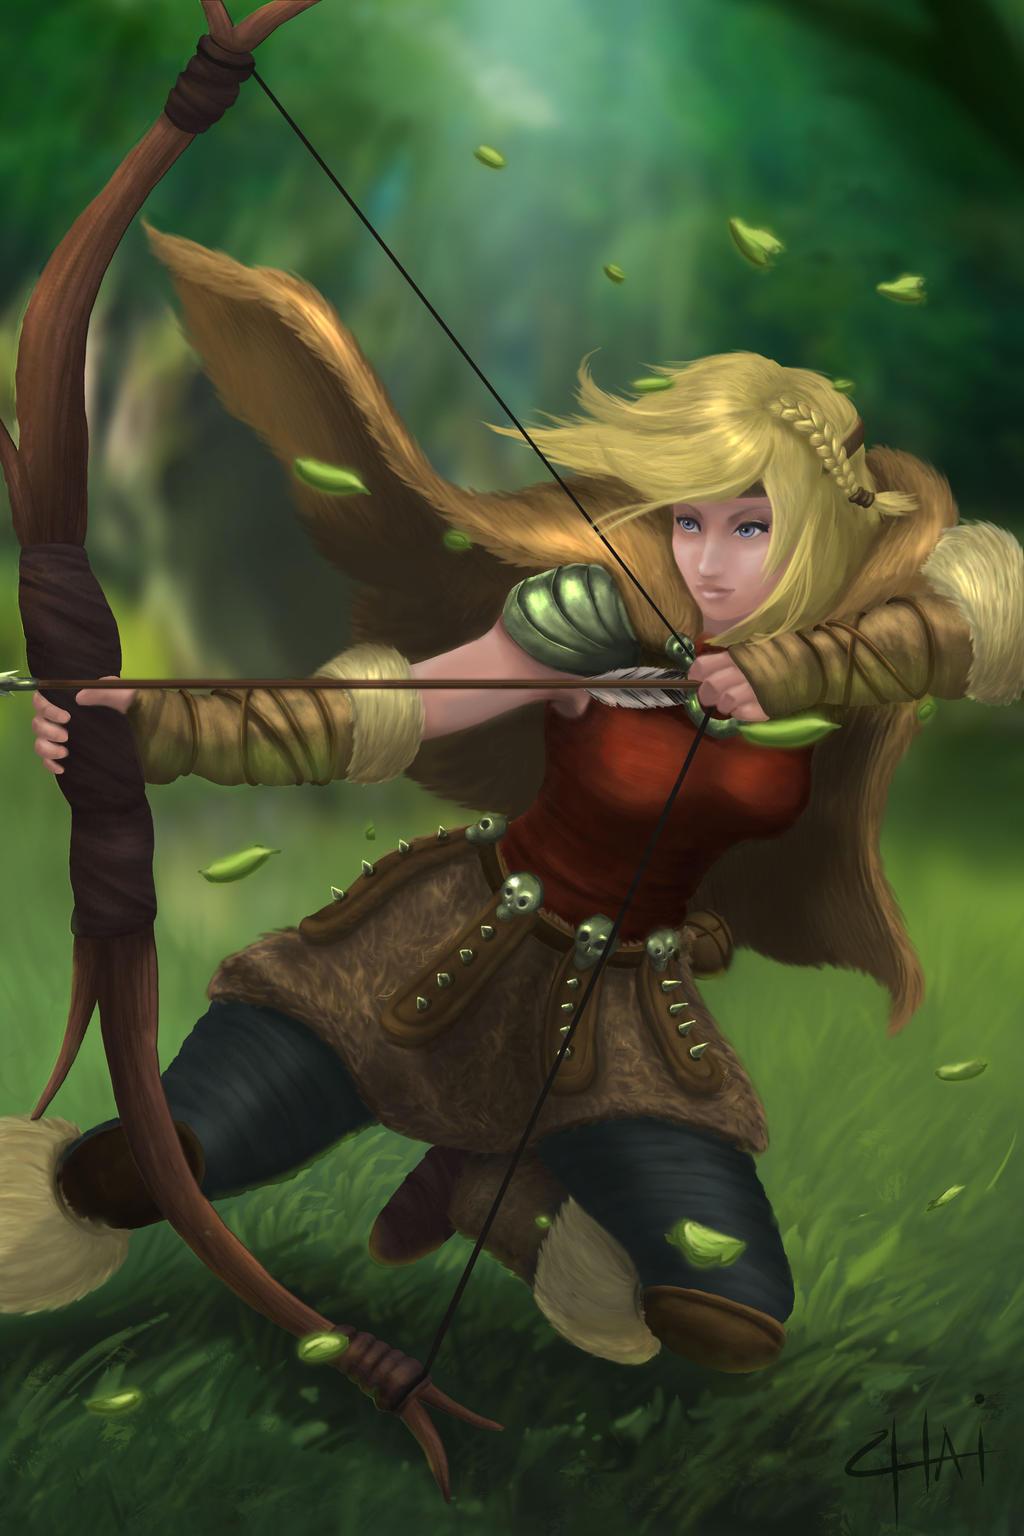 Uncategorized Astrid From How To Train Your Dragon how to train your dragon 2 astrid as an archer by zerox ii on ii